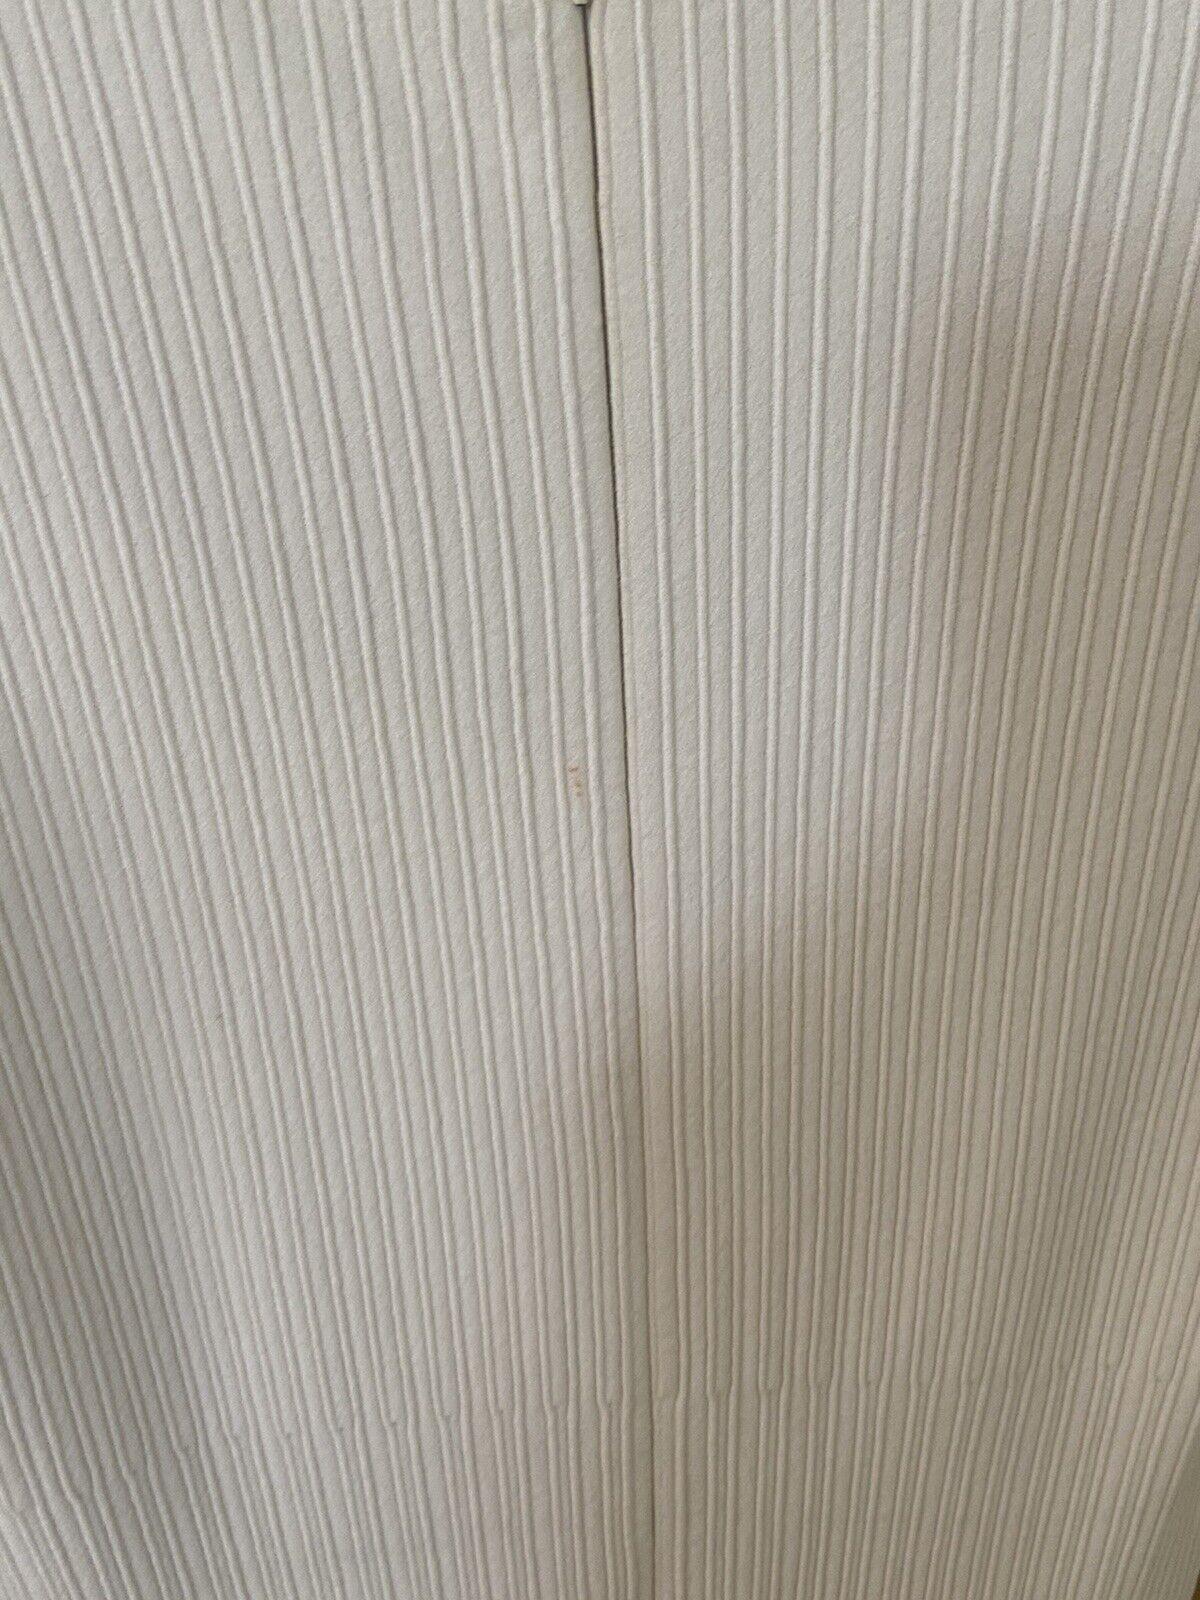 Azzedine Alaia White Long Sleeve Top Blouse Dress… - image 3